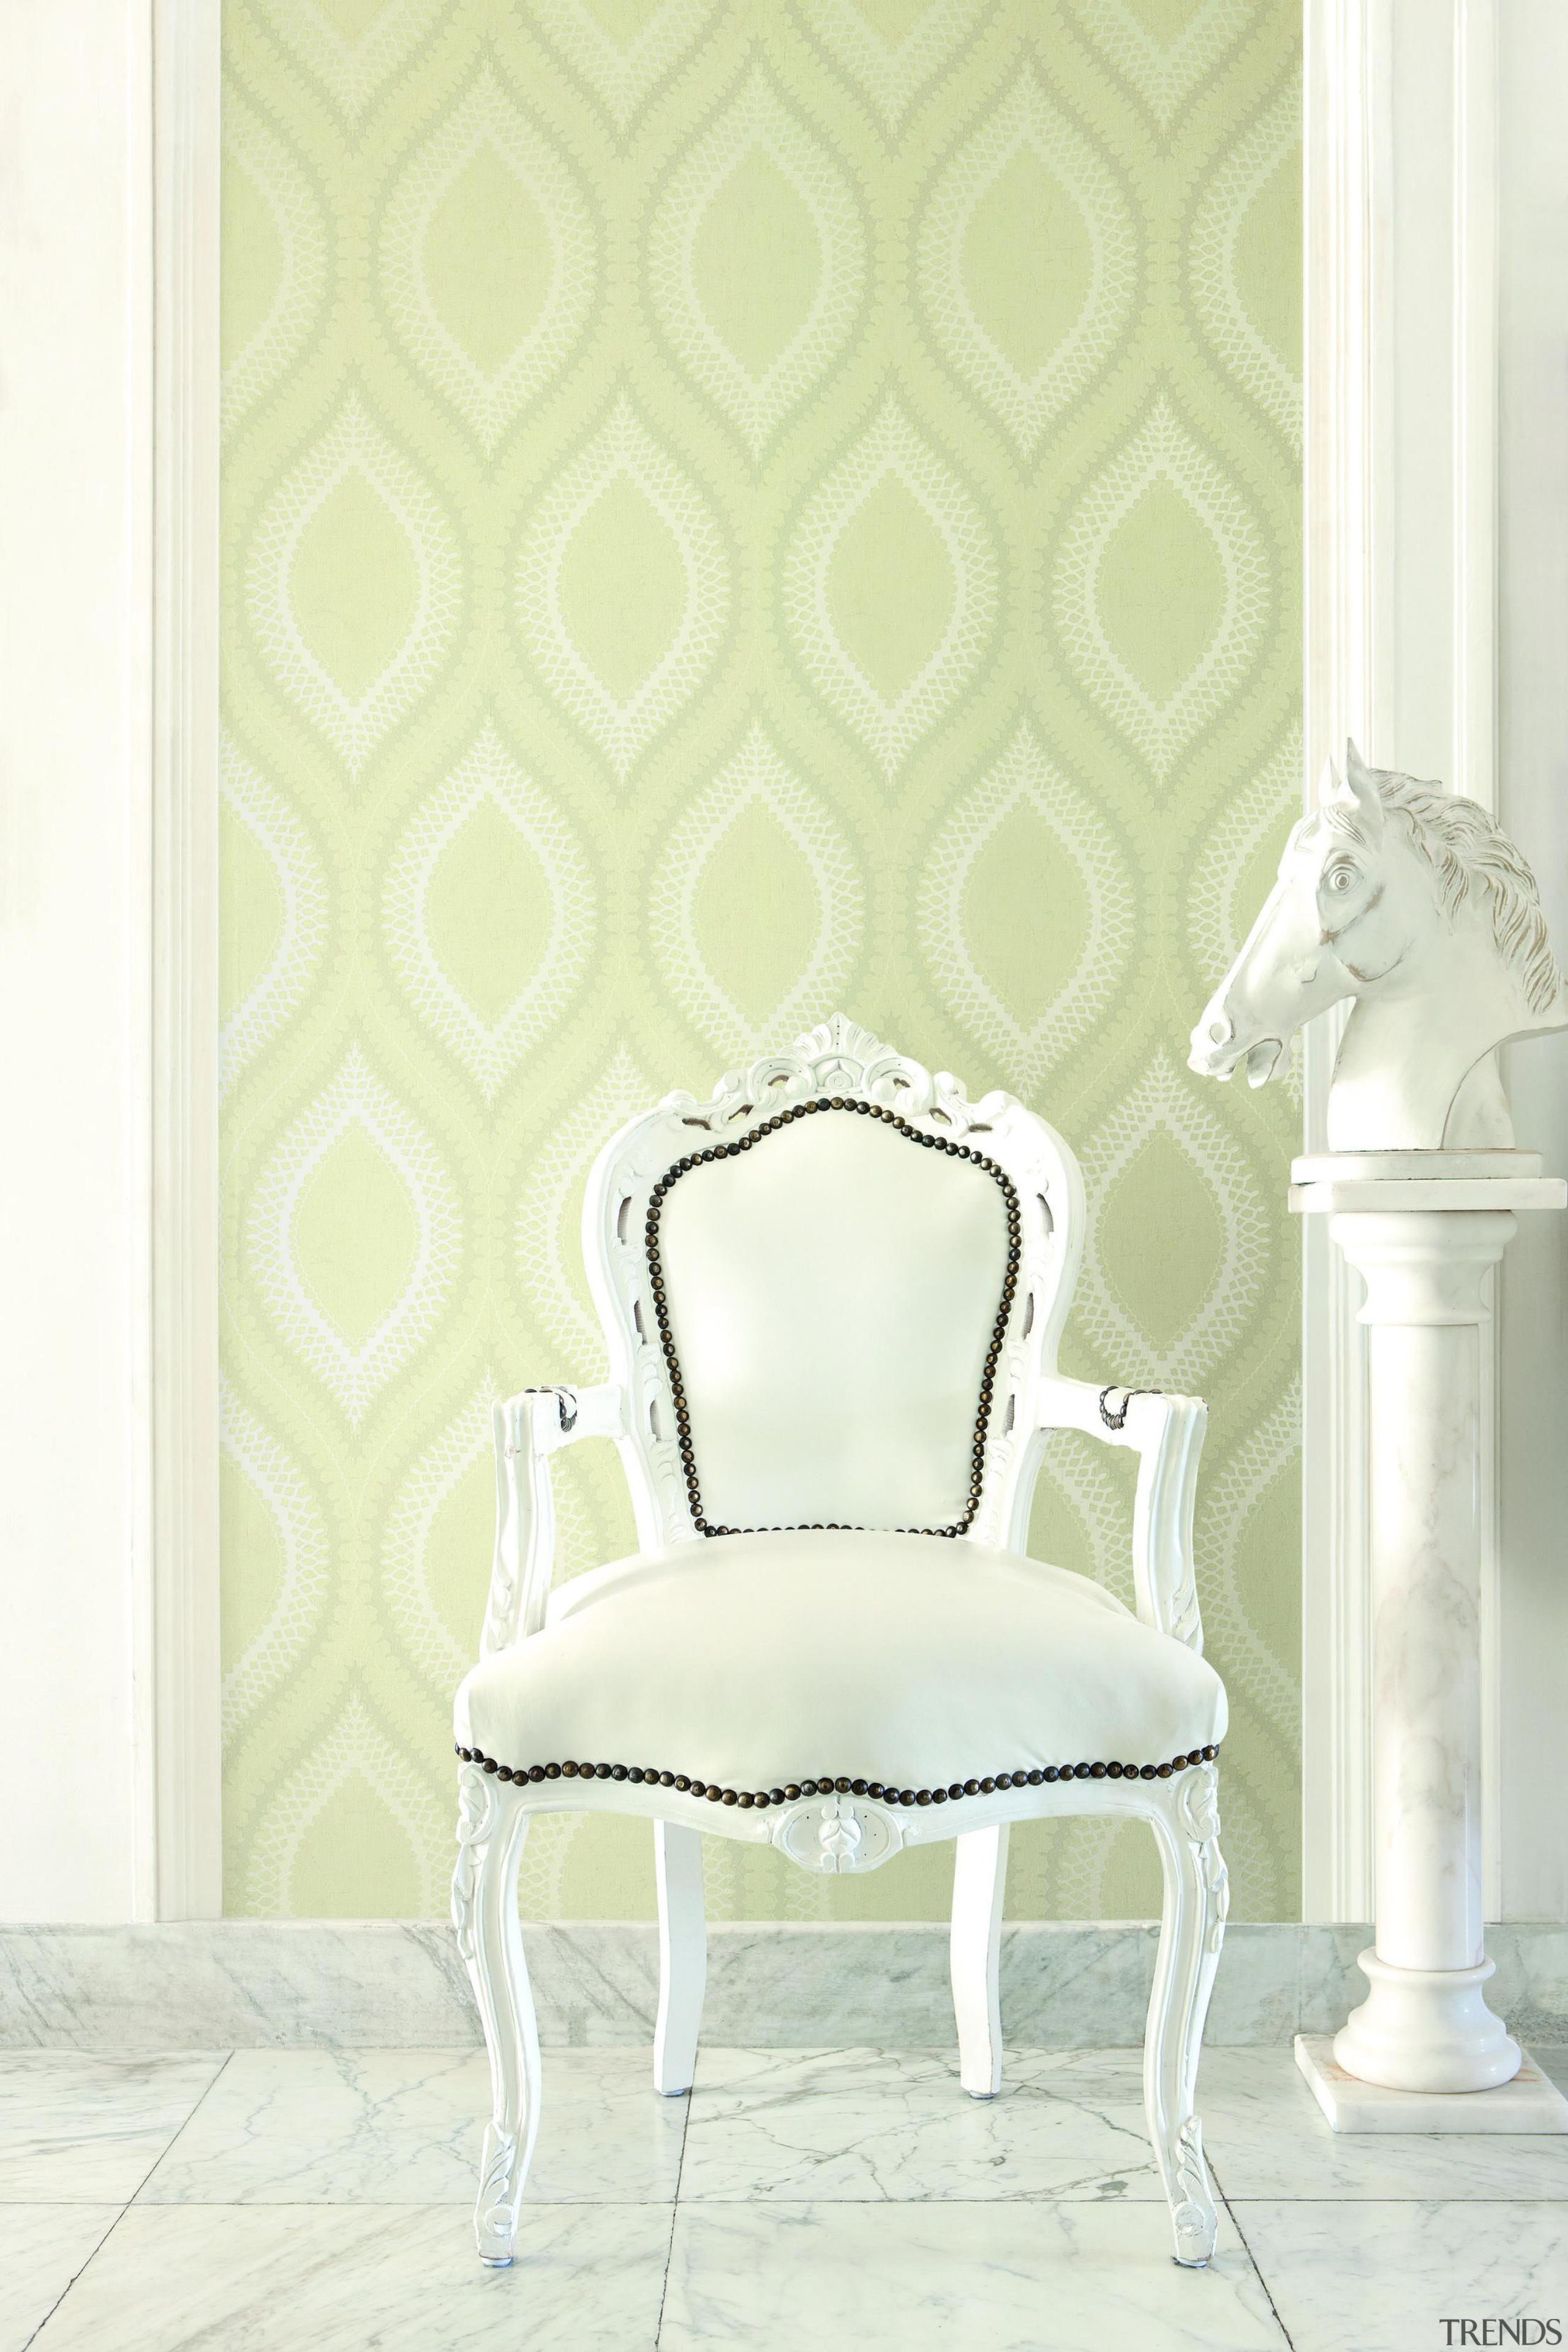 Hidden Richness Range - Hidden Richness Range - chair, decor, floor, furniture, interior design, pattern, product design, table, wall, wallpaper, yellow